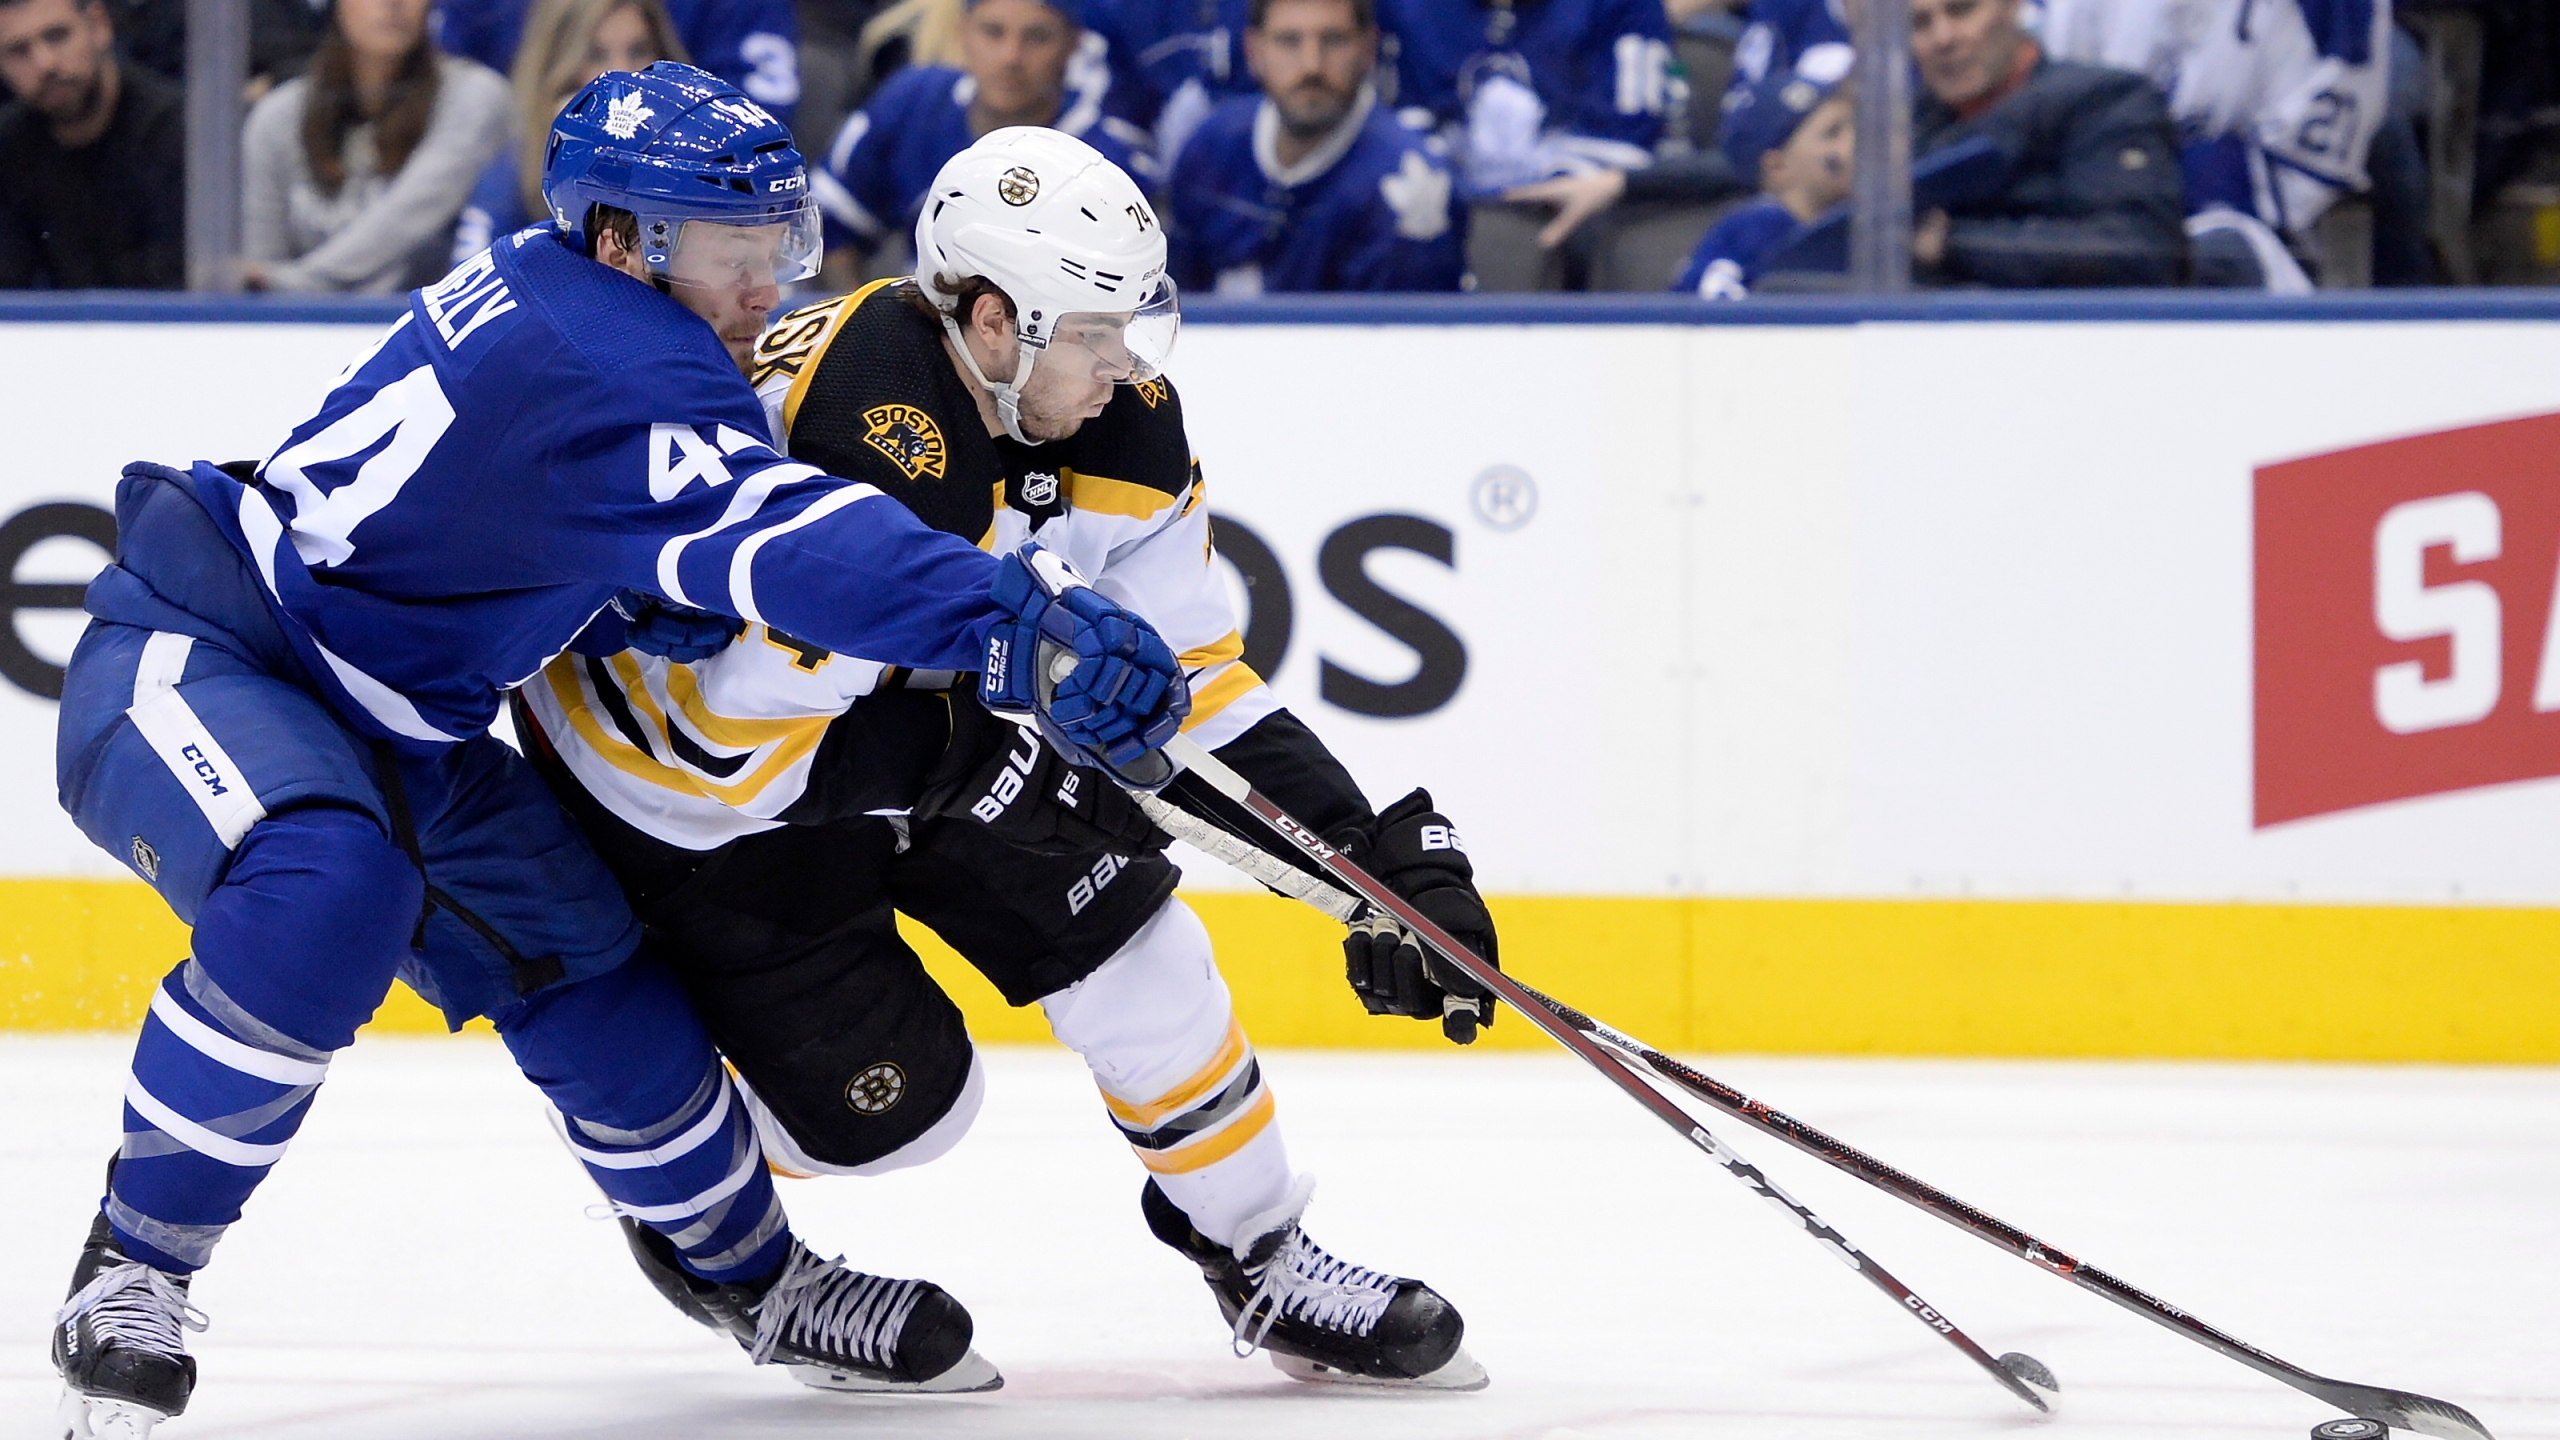 Bruins_Maple_Leafs_Hockey_80762-159532.jpg52433407